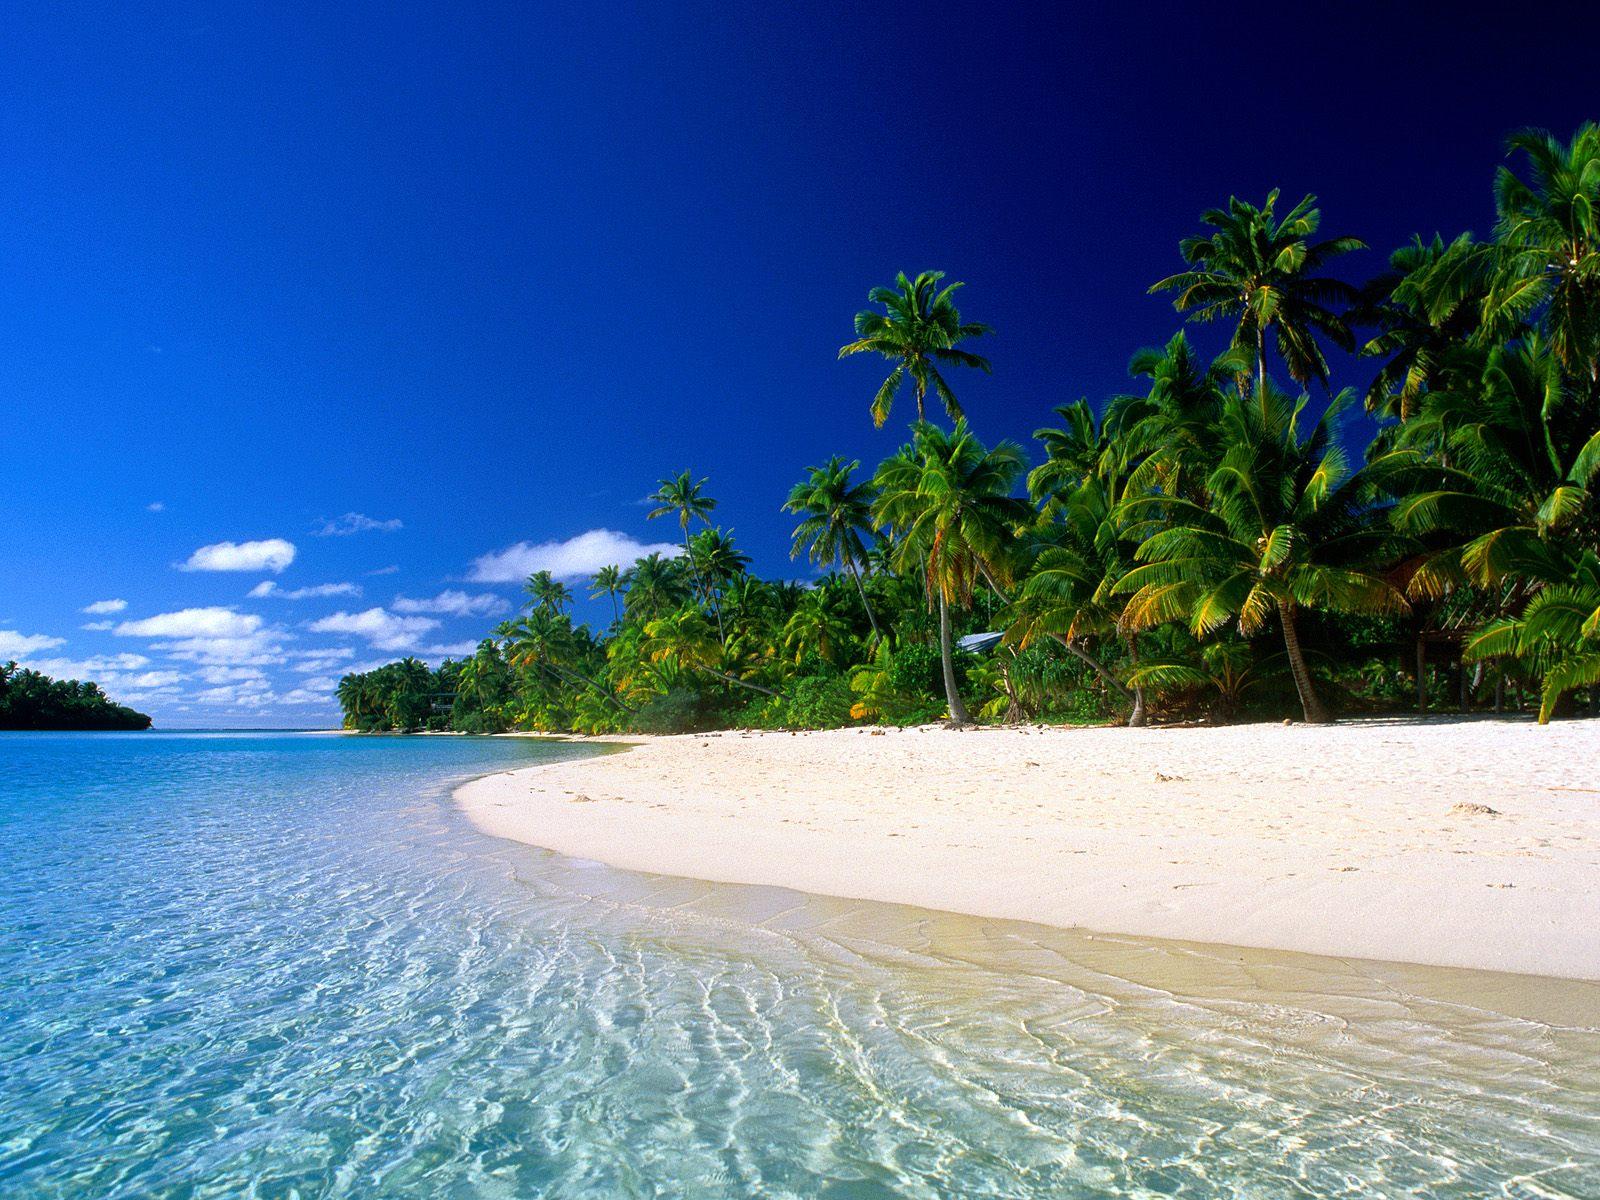 ... Island Wallpaper; Island Wallpaper